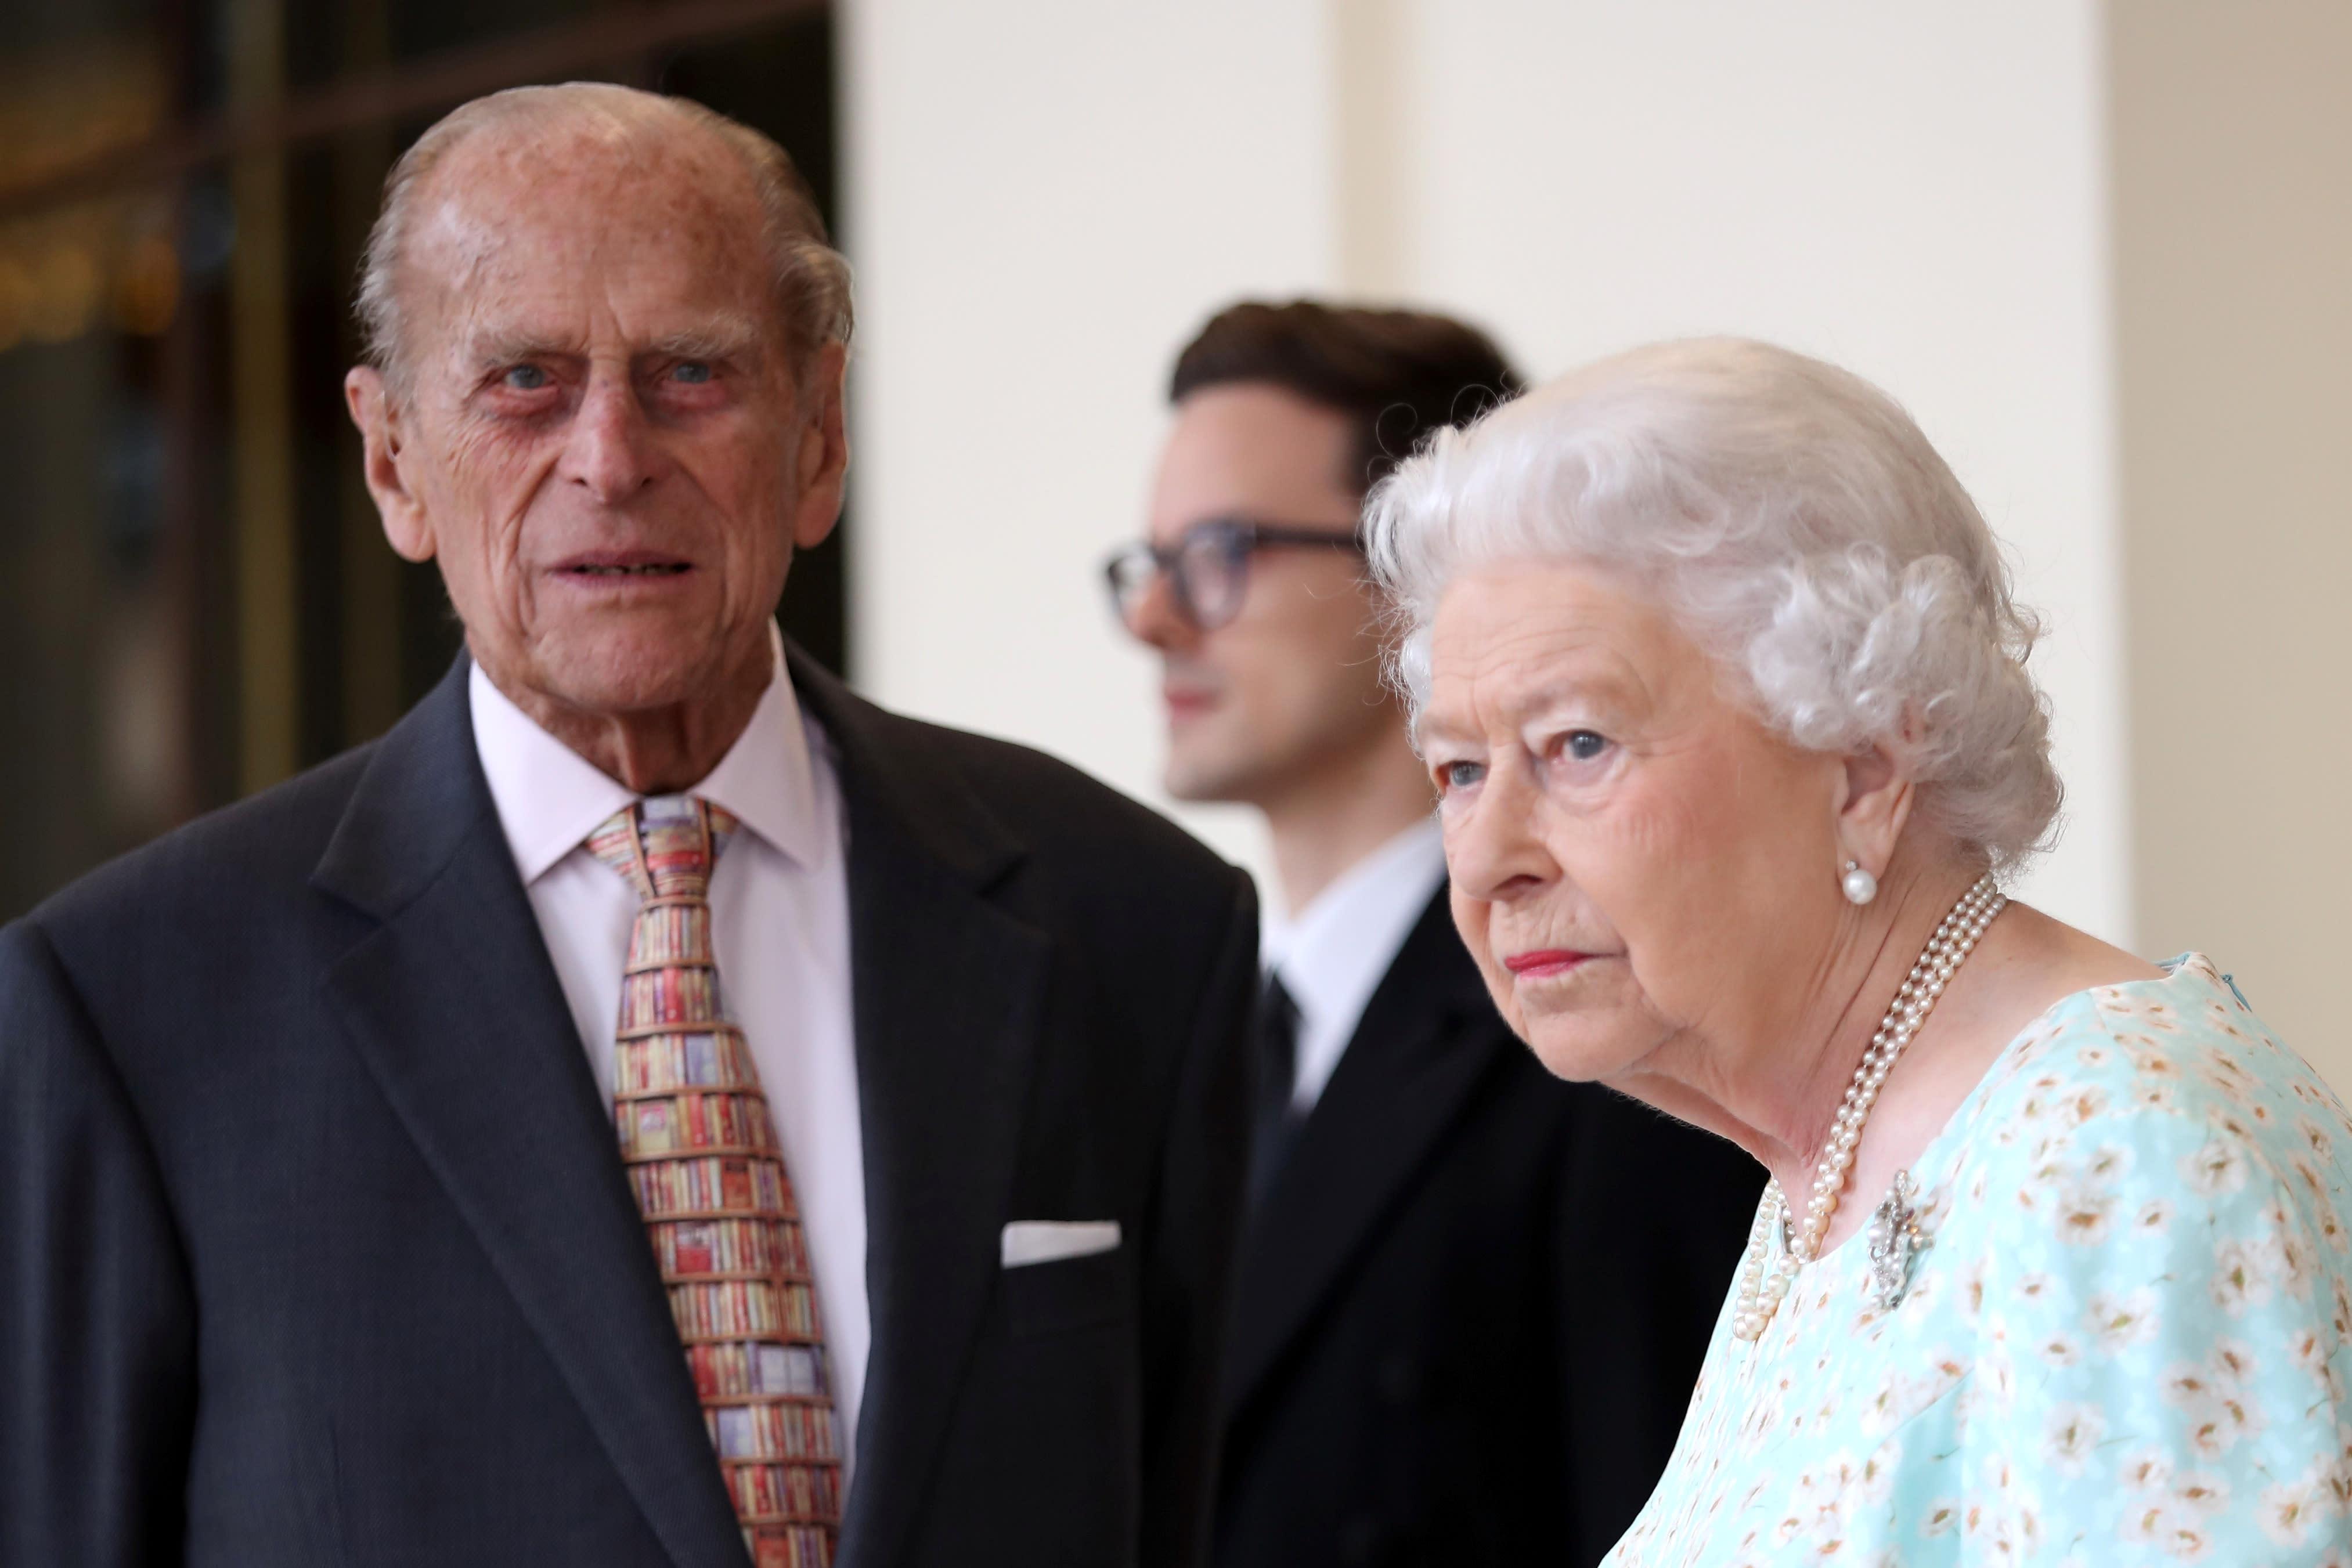 Britain's Queen Elizabeth II and Prince Philip, Duke of Edinburgh bid farewell to Spain's King Felipe and Queen Letizia at Buckingham Palace in London, Britain July 14, 2017. REUTERS/Chris Jackson/Pool